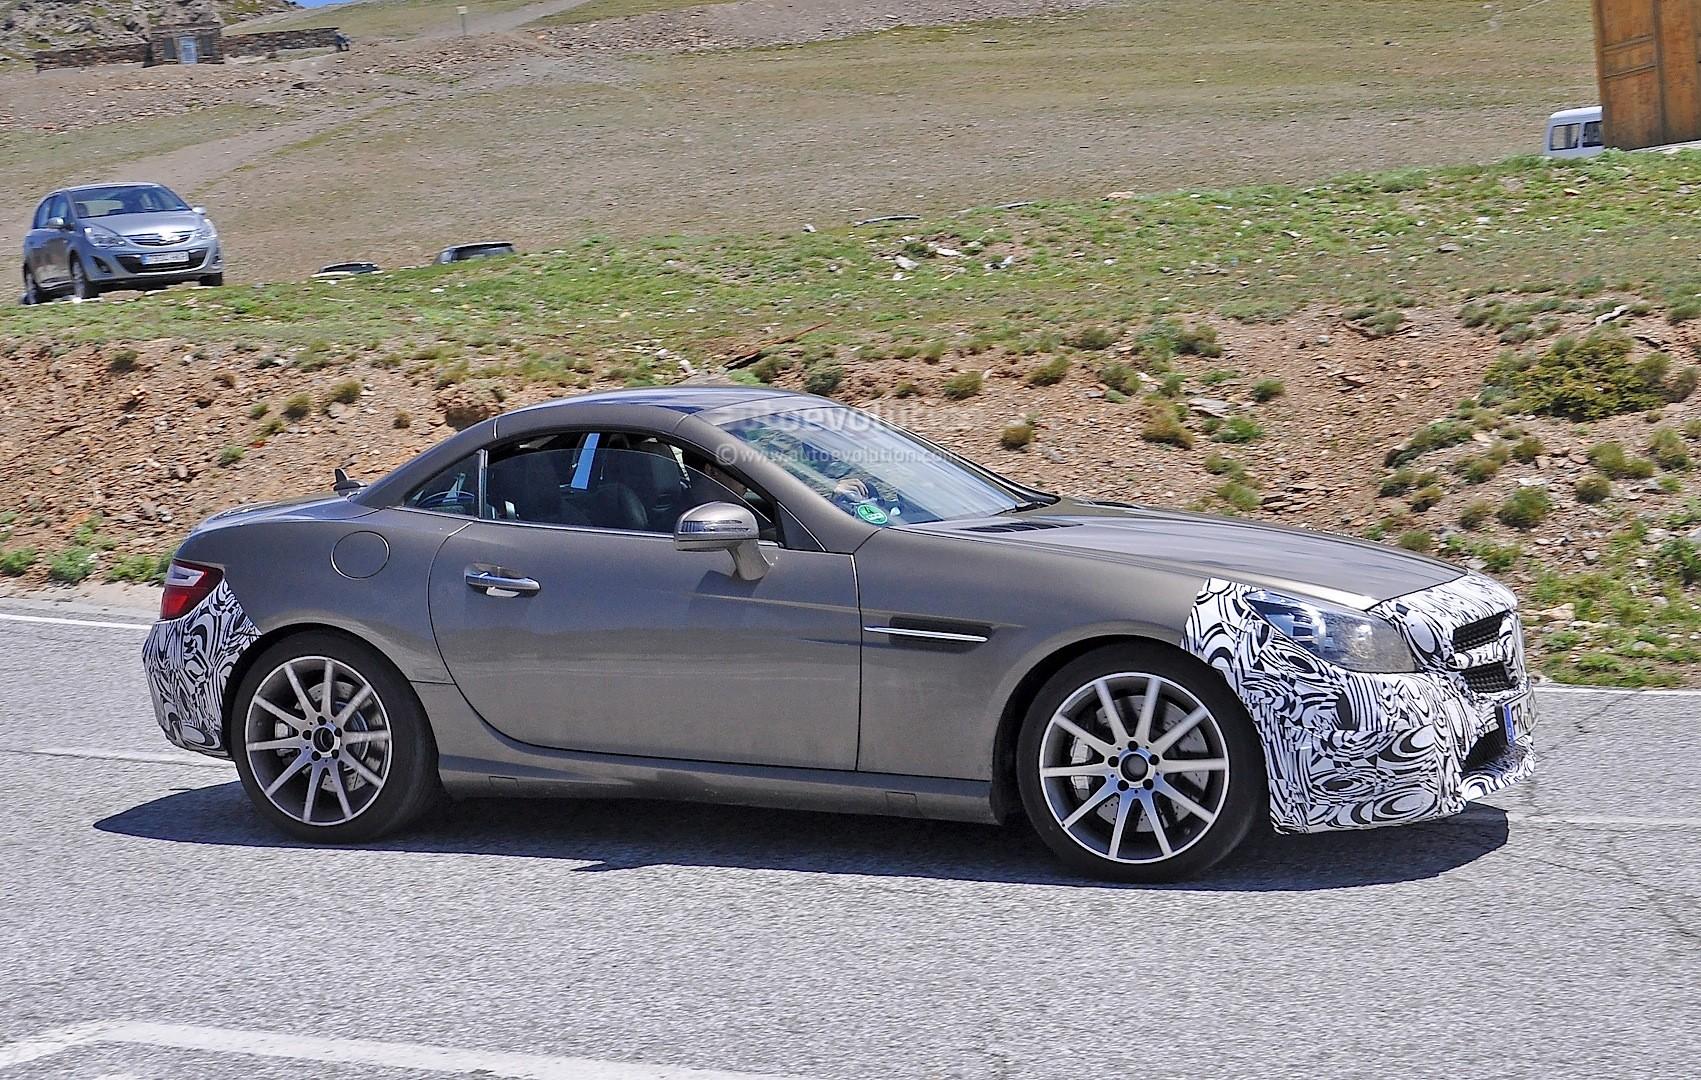 2016 mercedes benz slc 450 amg sport spied on public roads for Mercedes benz 450 slc